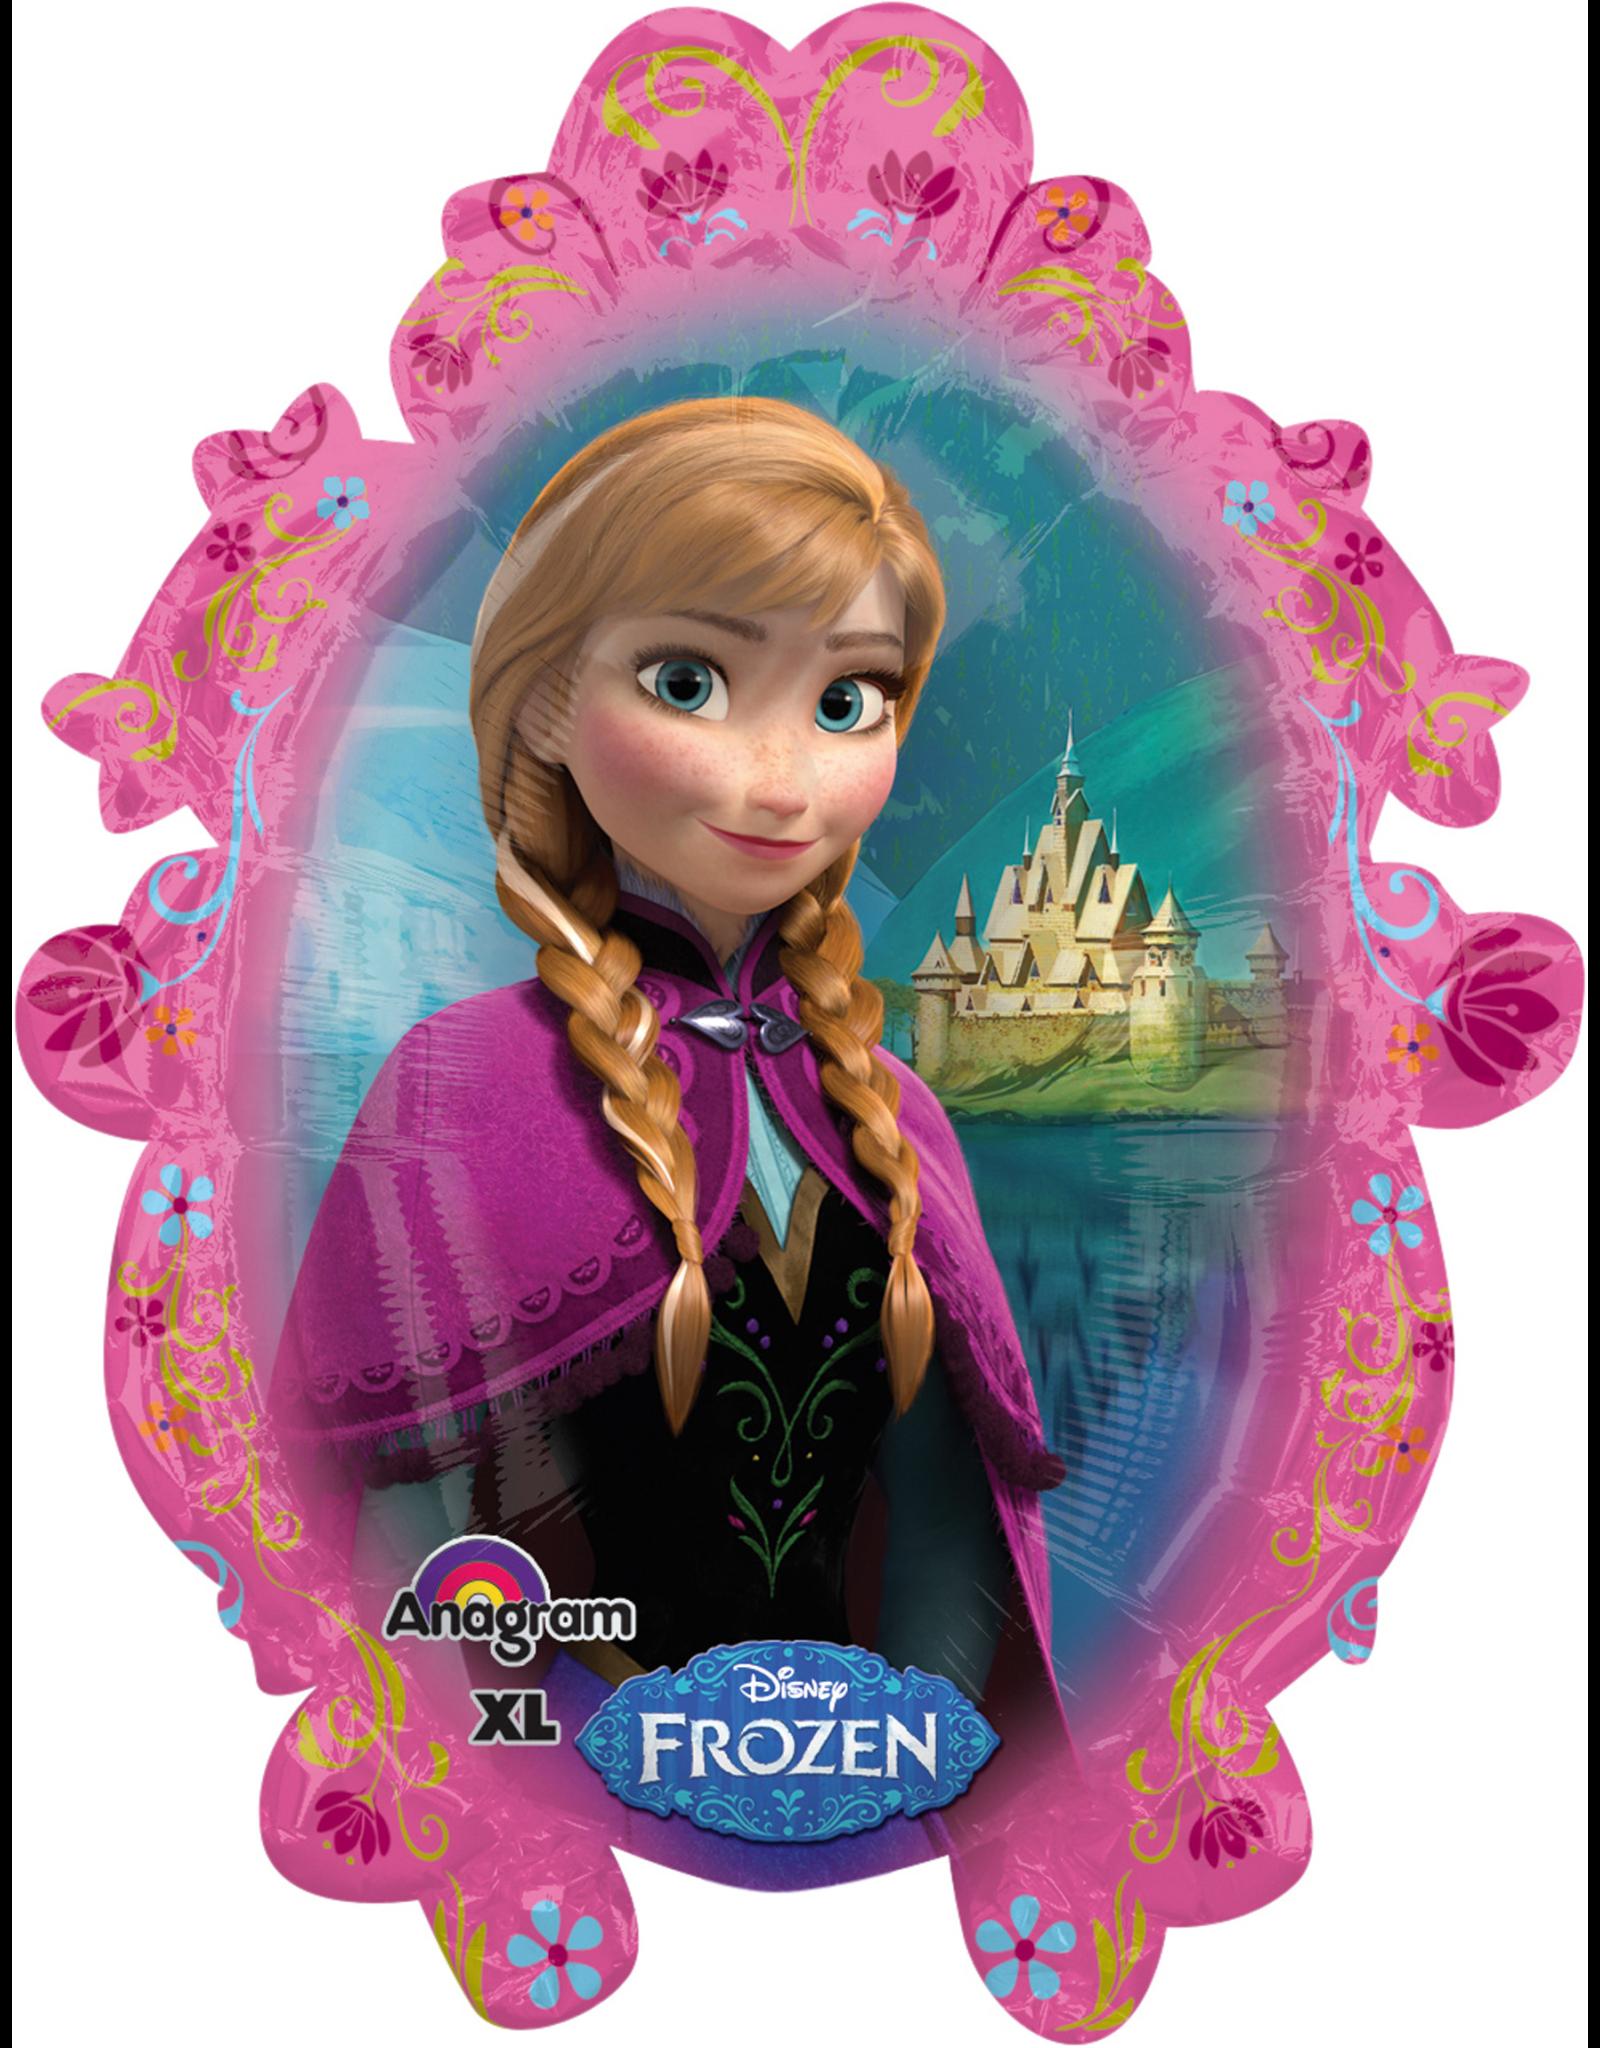 Amscan folieballon Frozen supershape 63 x 78 cm